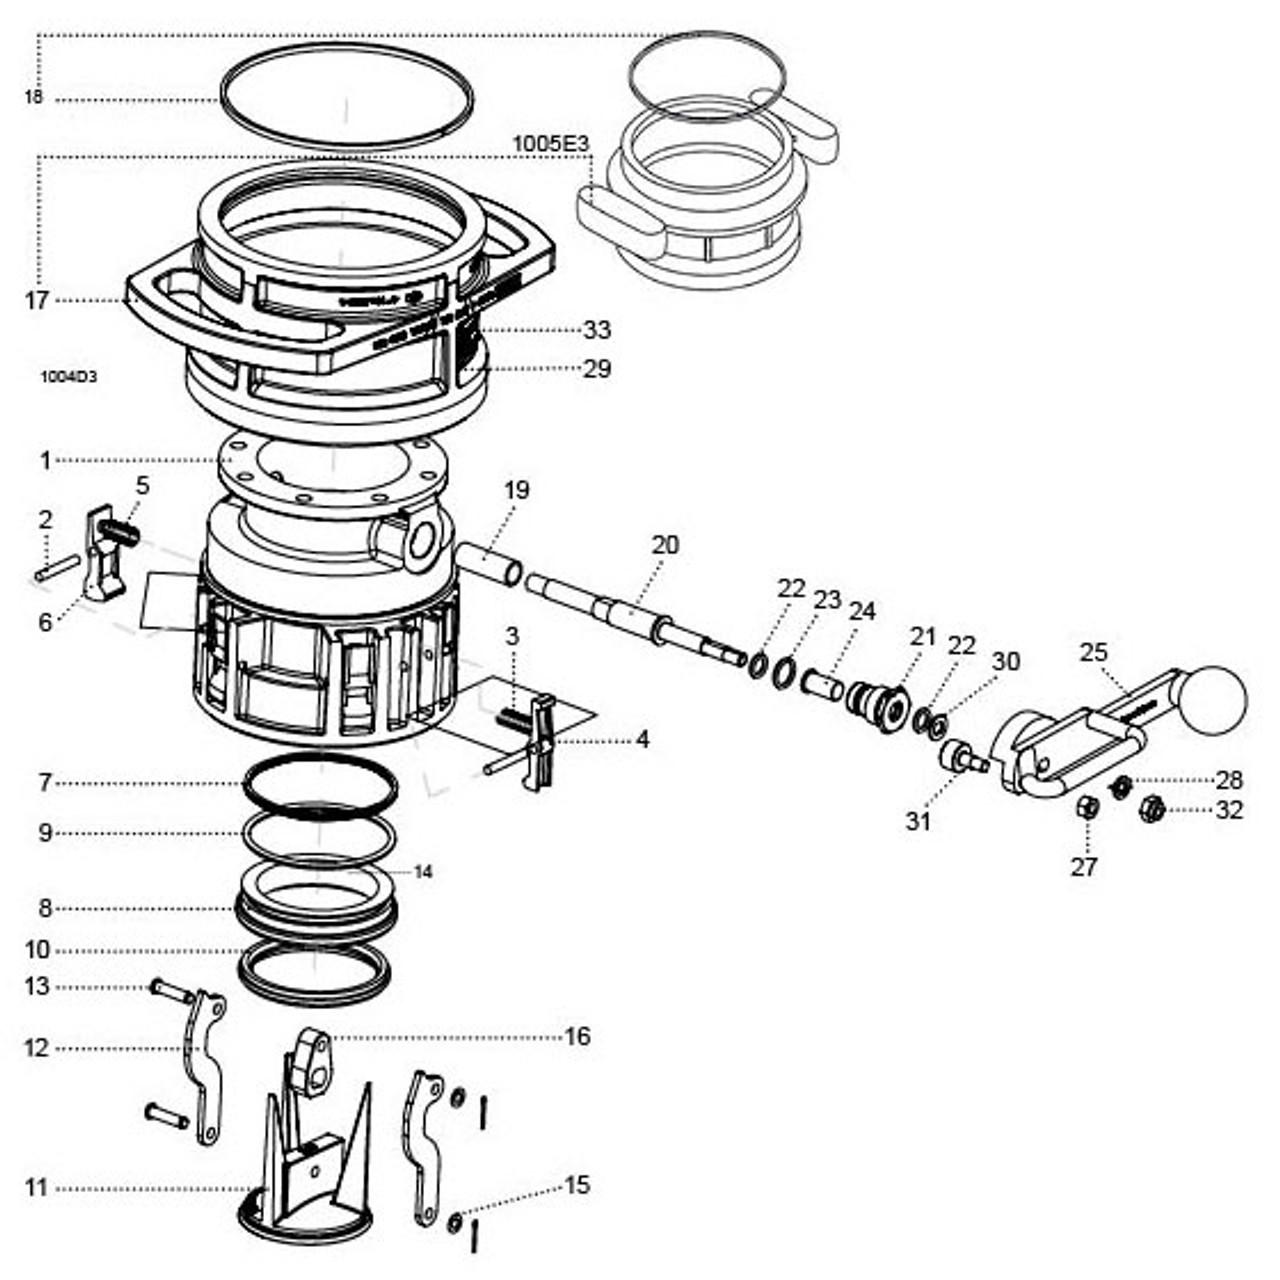 opw 1004d3 coupler parts stuff box o ring smaller gflt viton